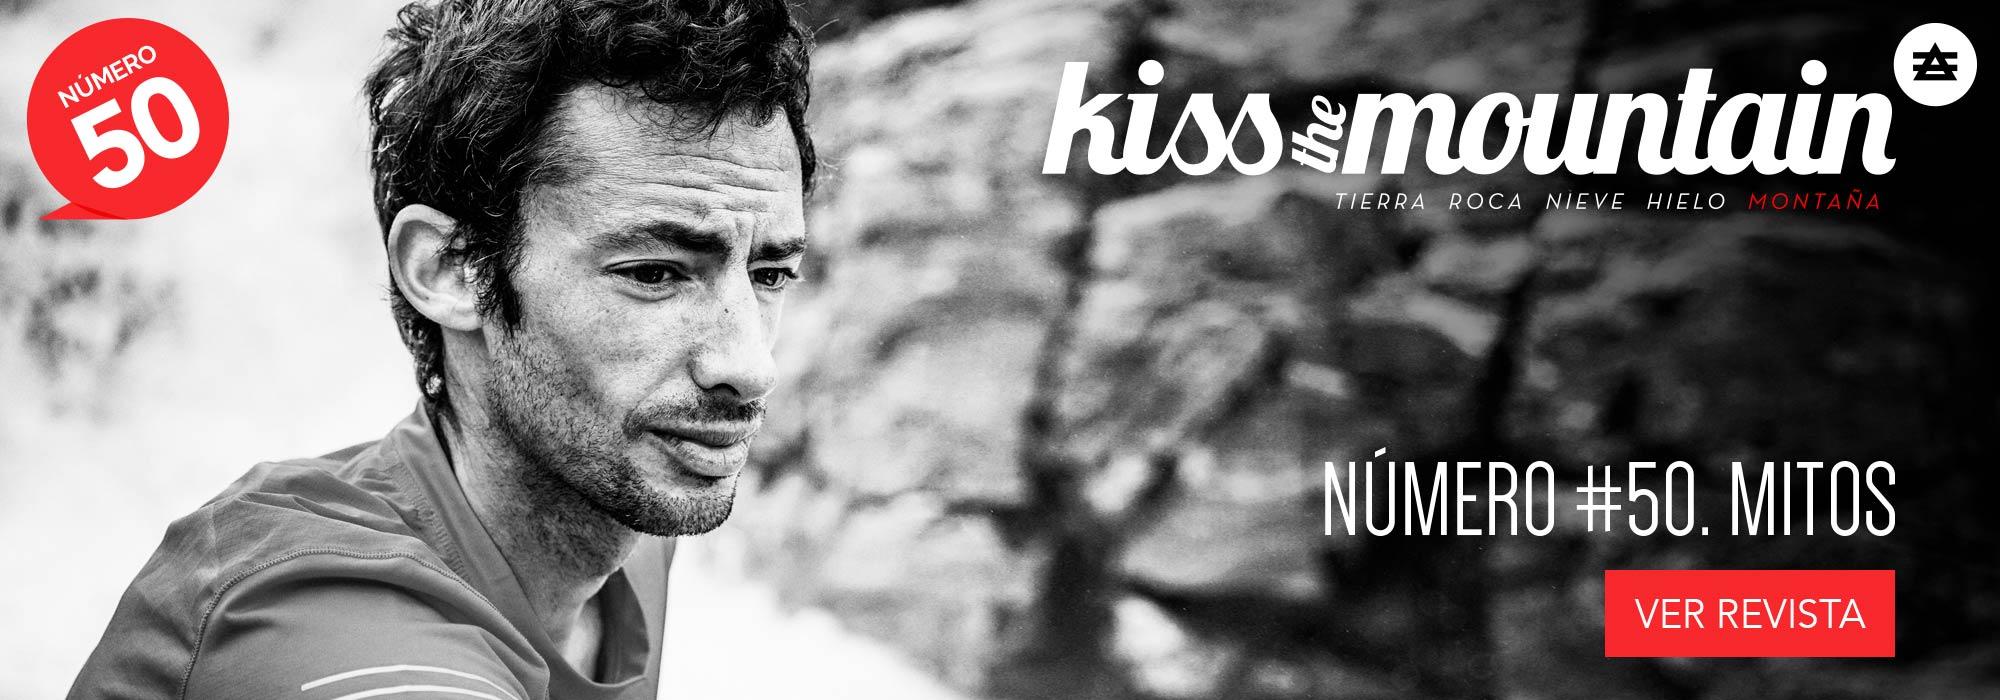 Kissthemountain-50-Kilian-Jornet_